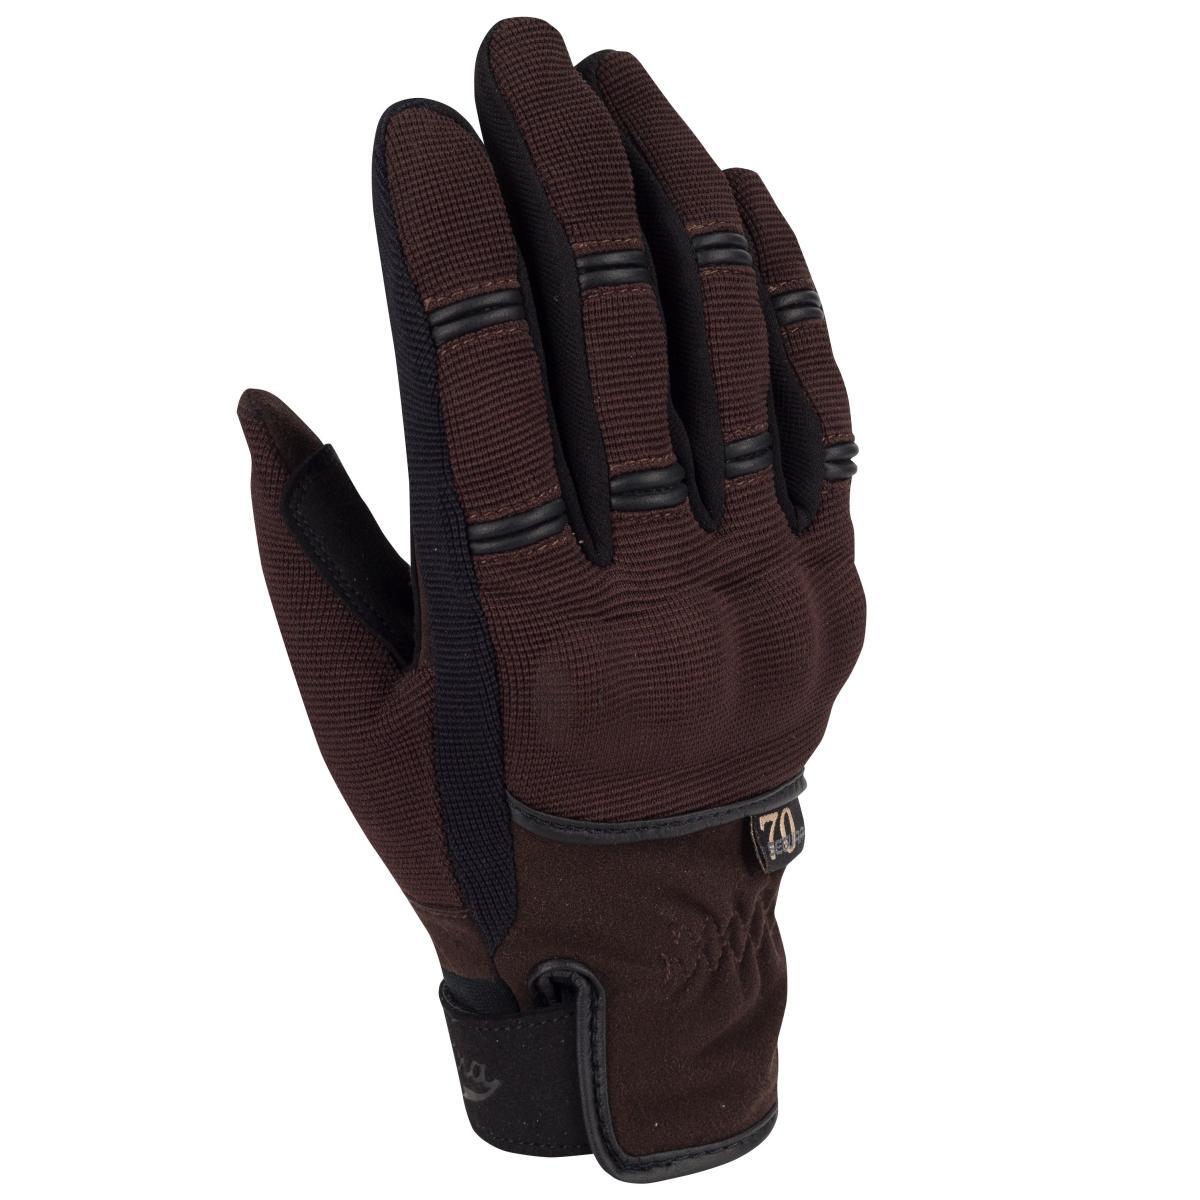 gants moto ete femme segura tobias marron noir. Black Bedroom Furniture Sets. Home Design Ideas